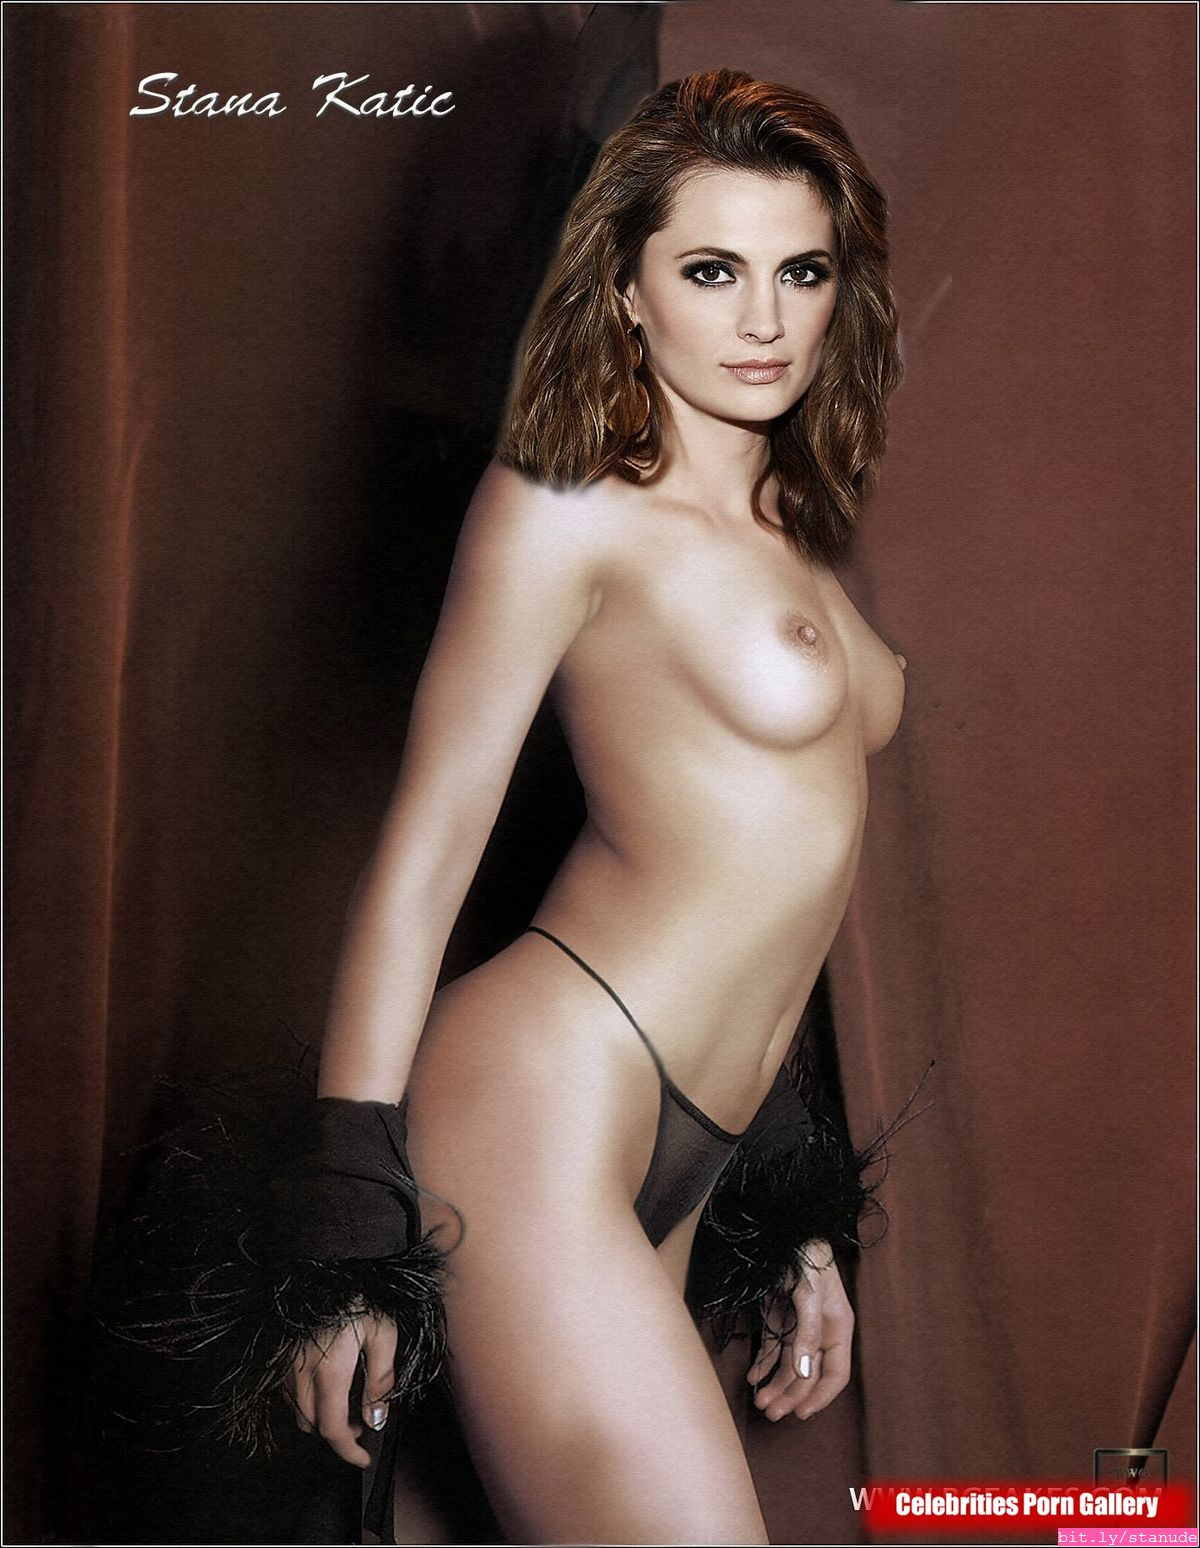 Stana katic naked